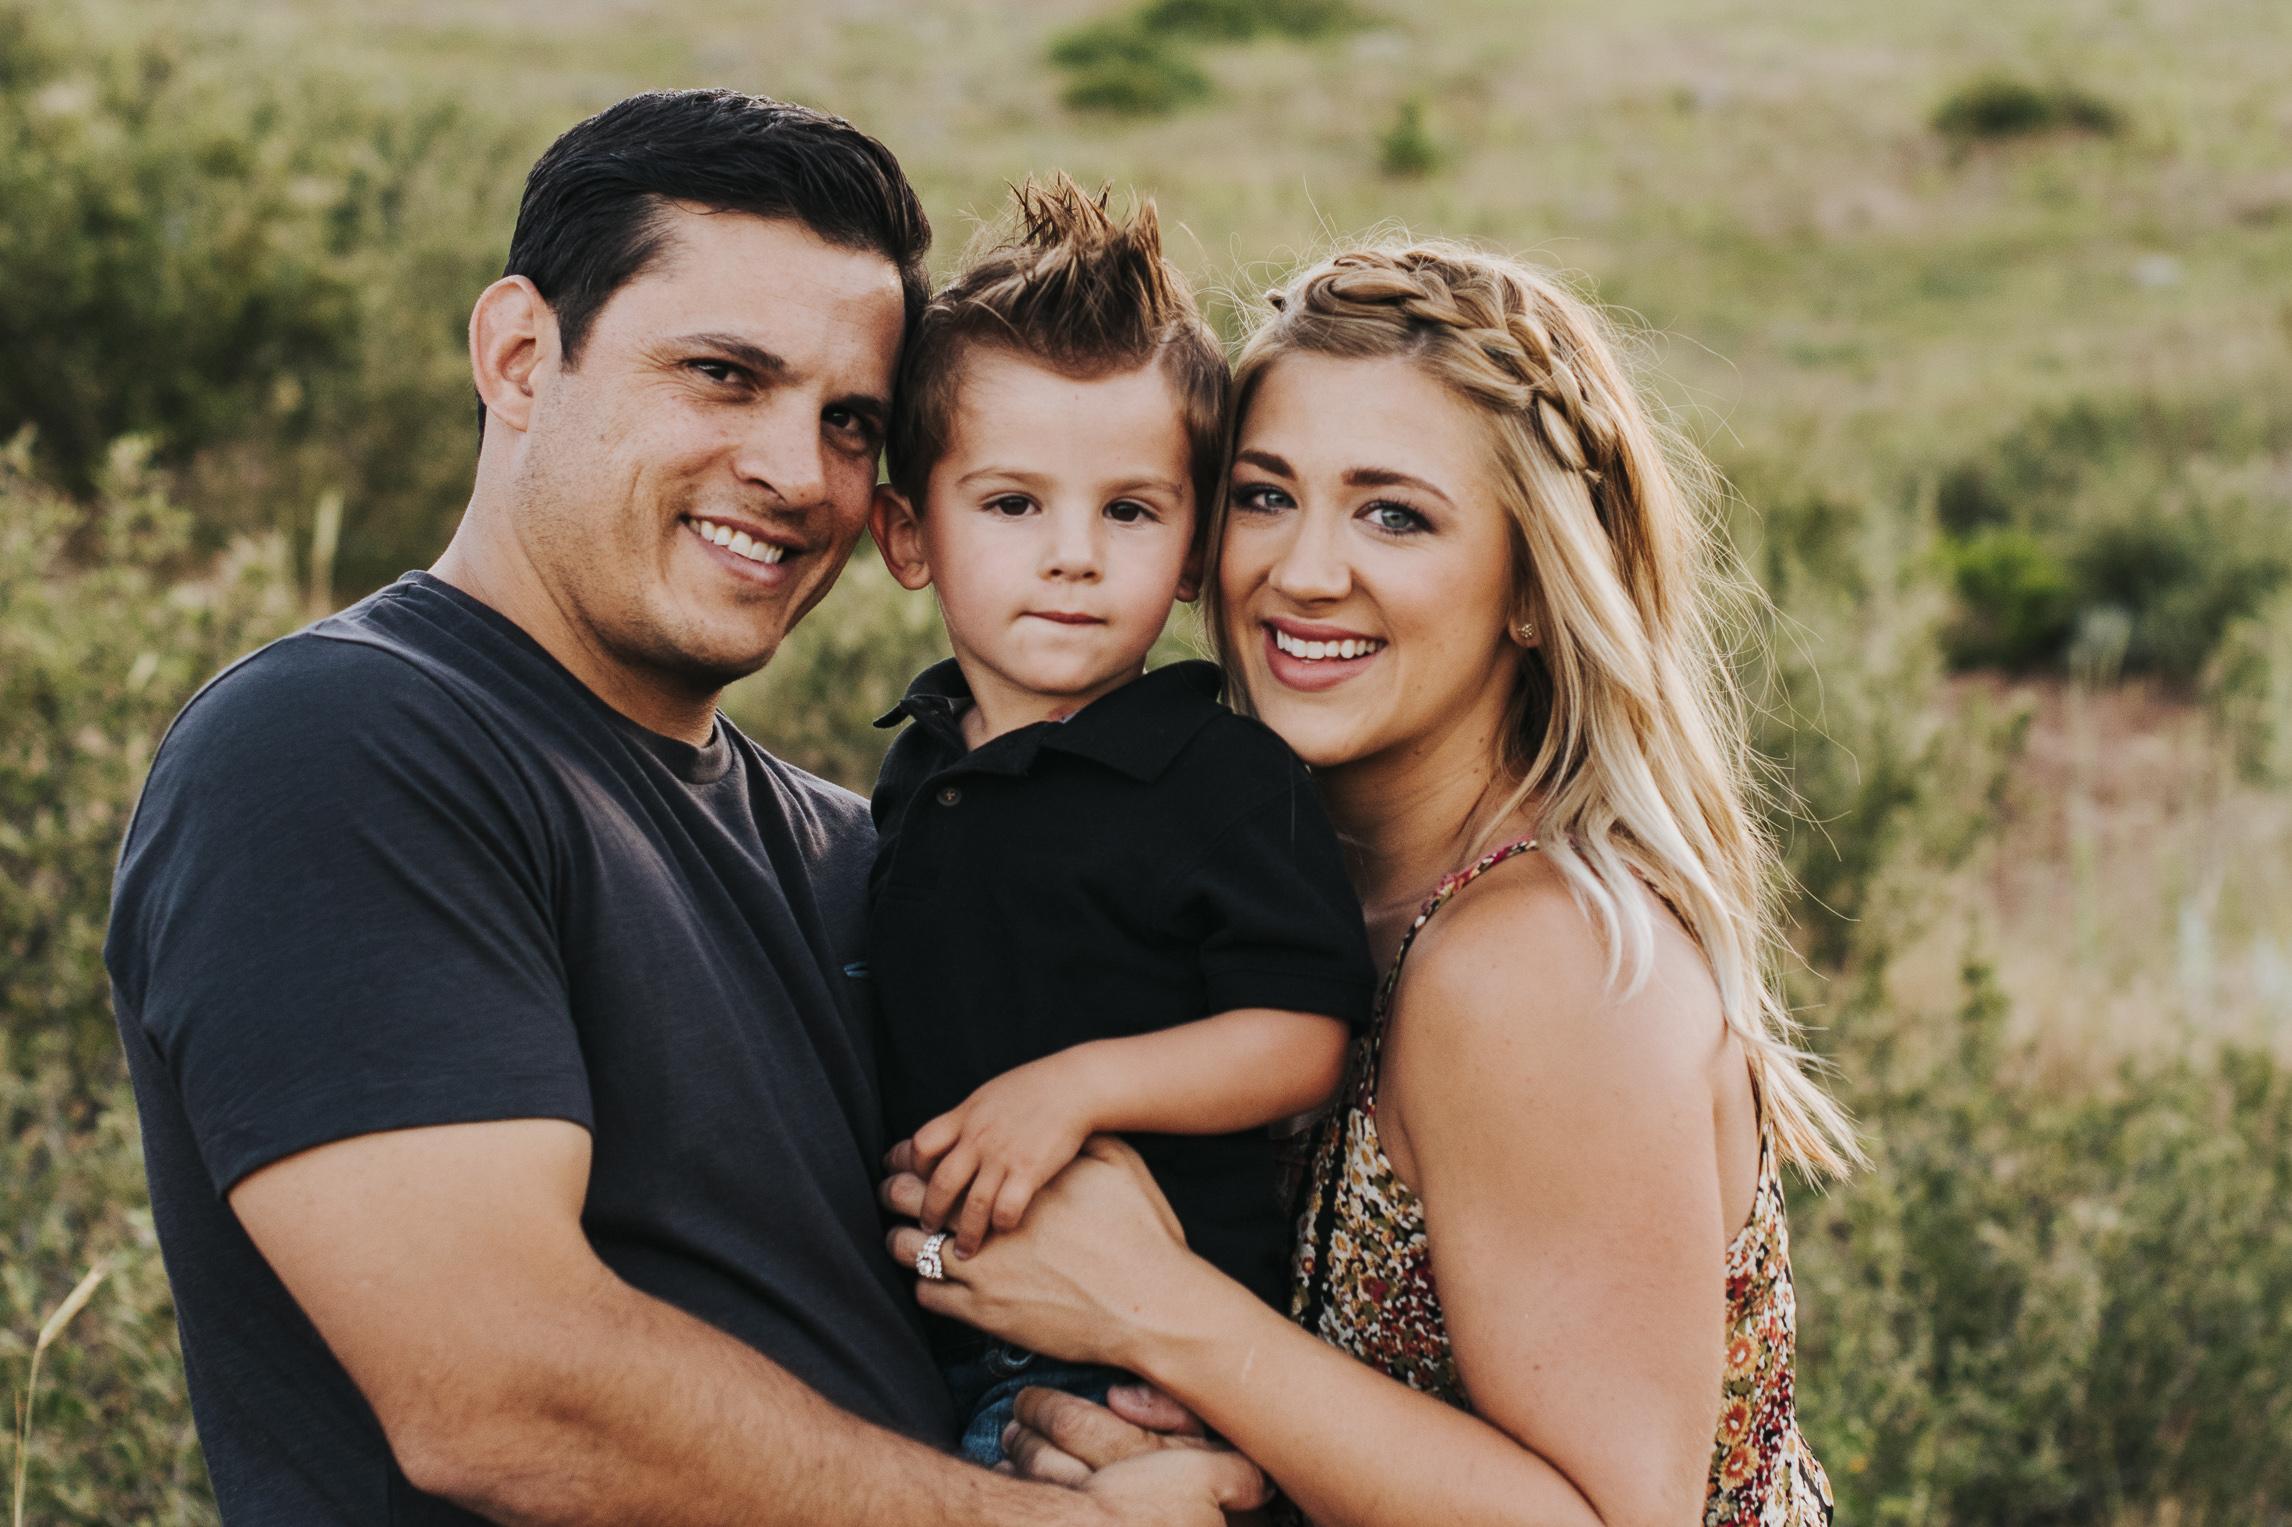 060716 webJAKE & MCKENNA FAMILY PHOTOS - COLORADO PHOTOGRAPHER - DEBI RAE PHOTOGRAPHY-5292.jpg